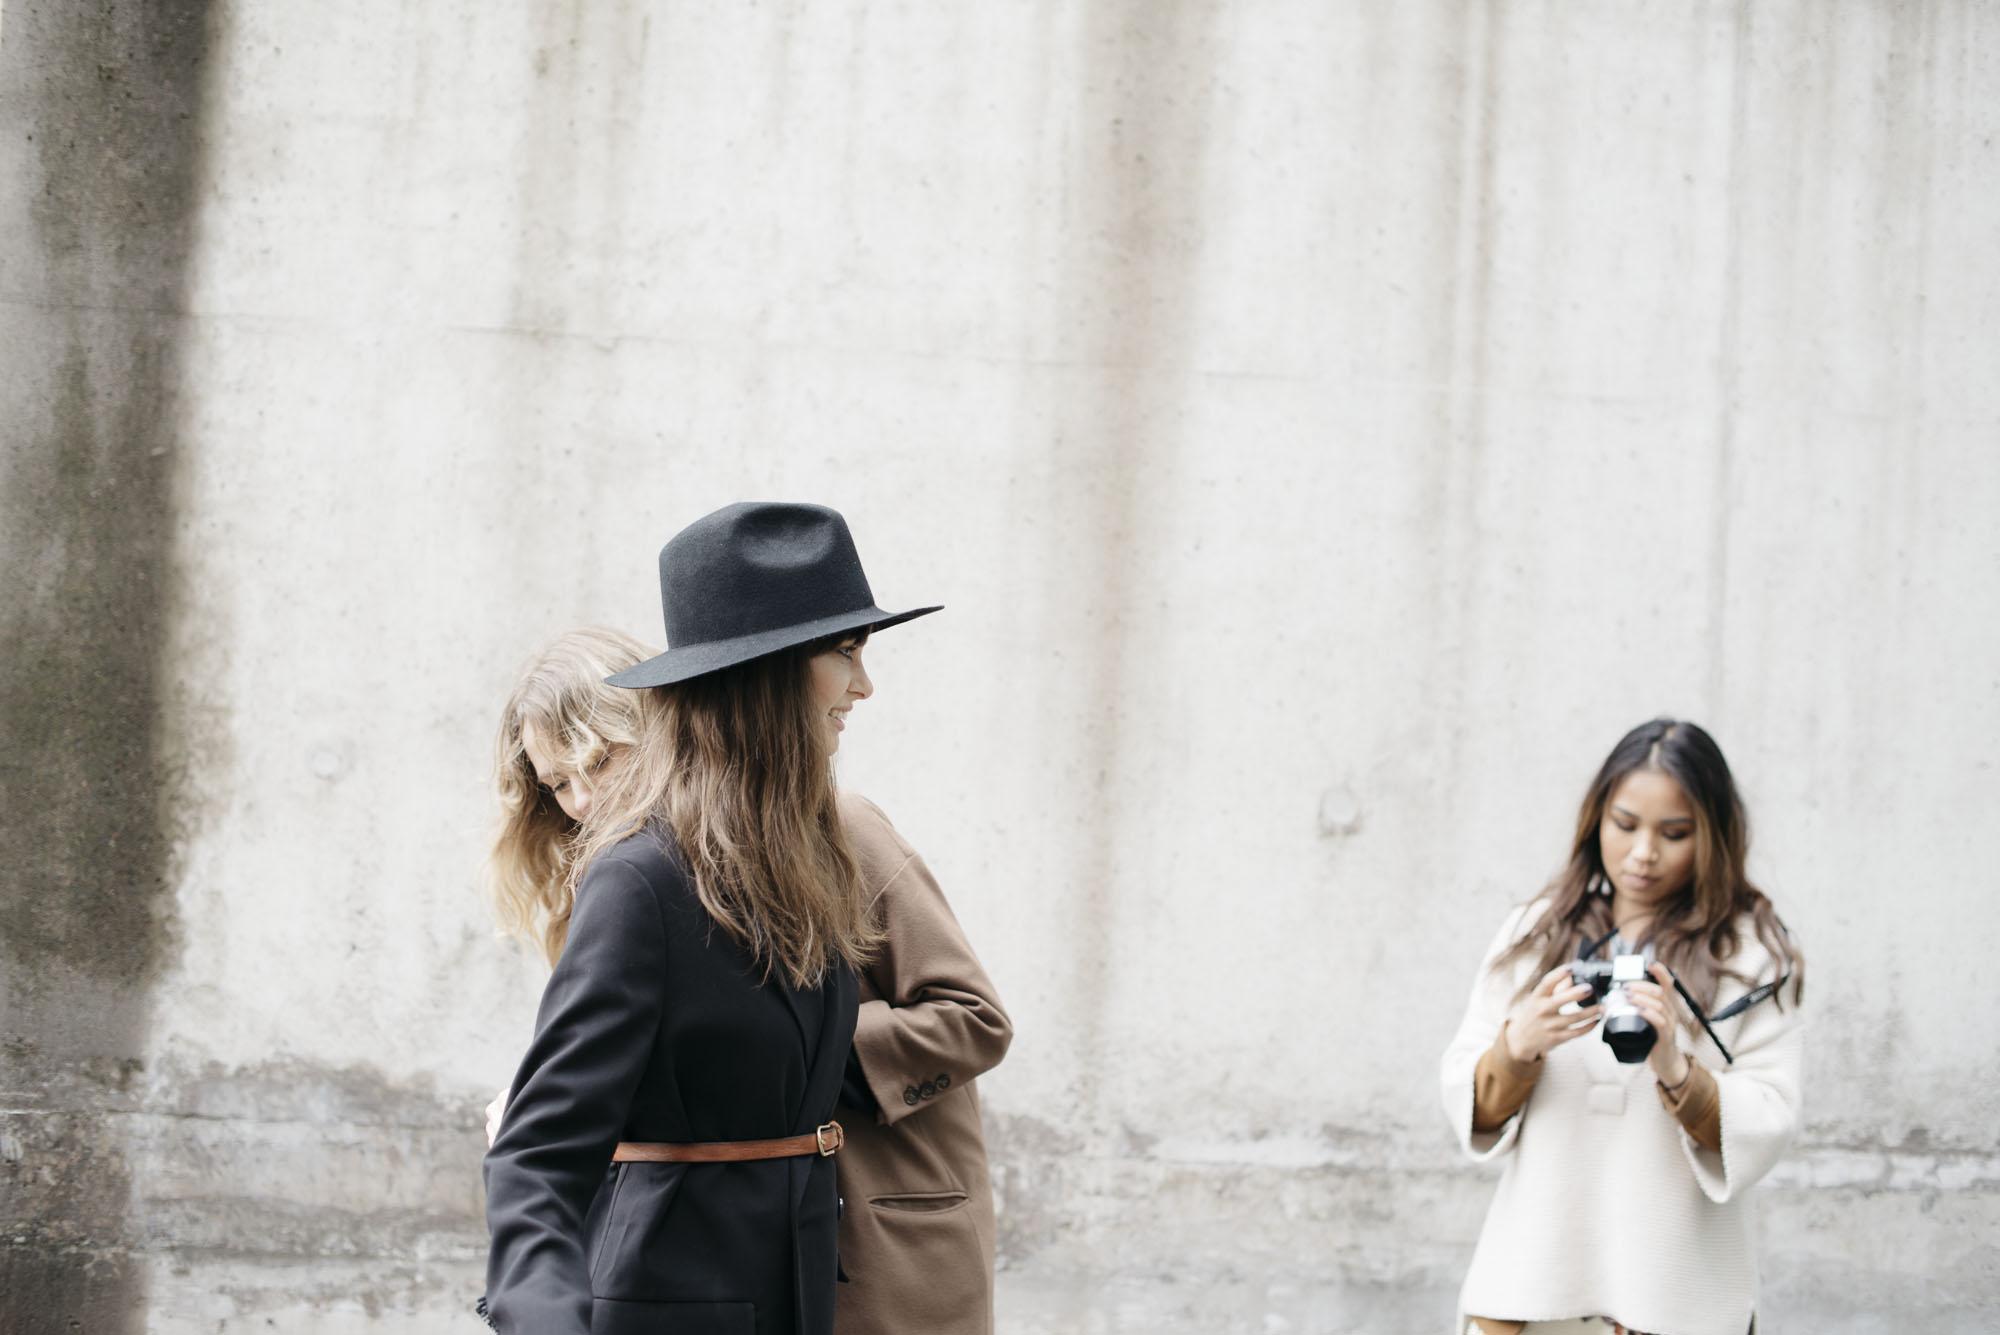 MUA Elin and Stylist Evelina with Anna